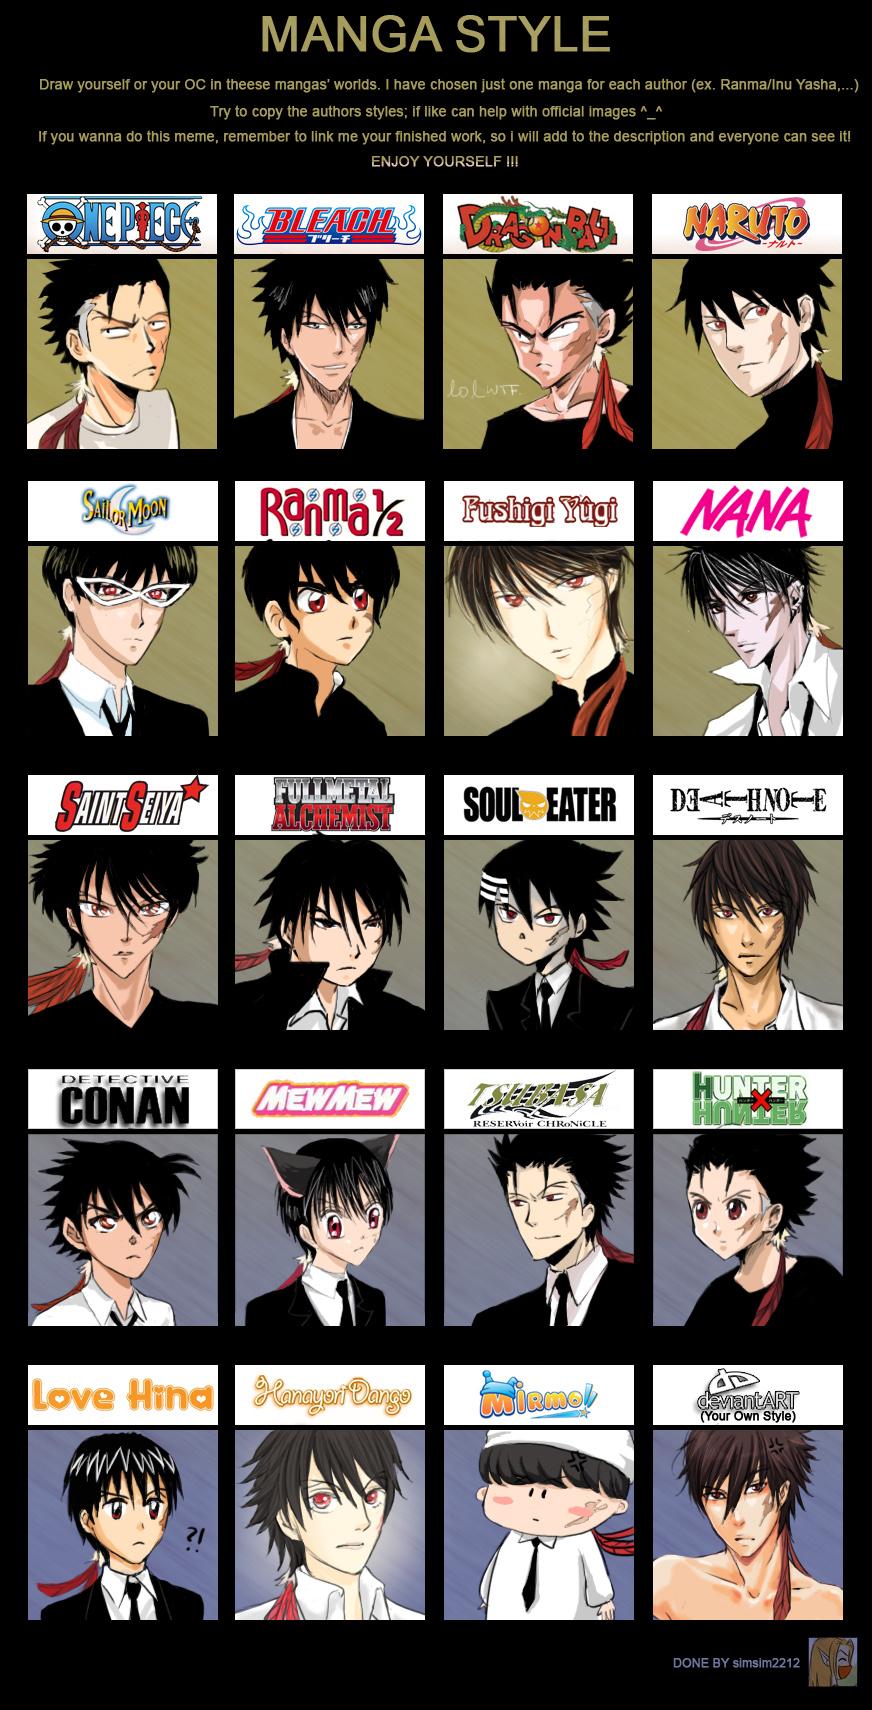 Tags Anime Simsim2212 SQUARE ENIX DEATH NOTE Fullmetal Alchemist Mirumo